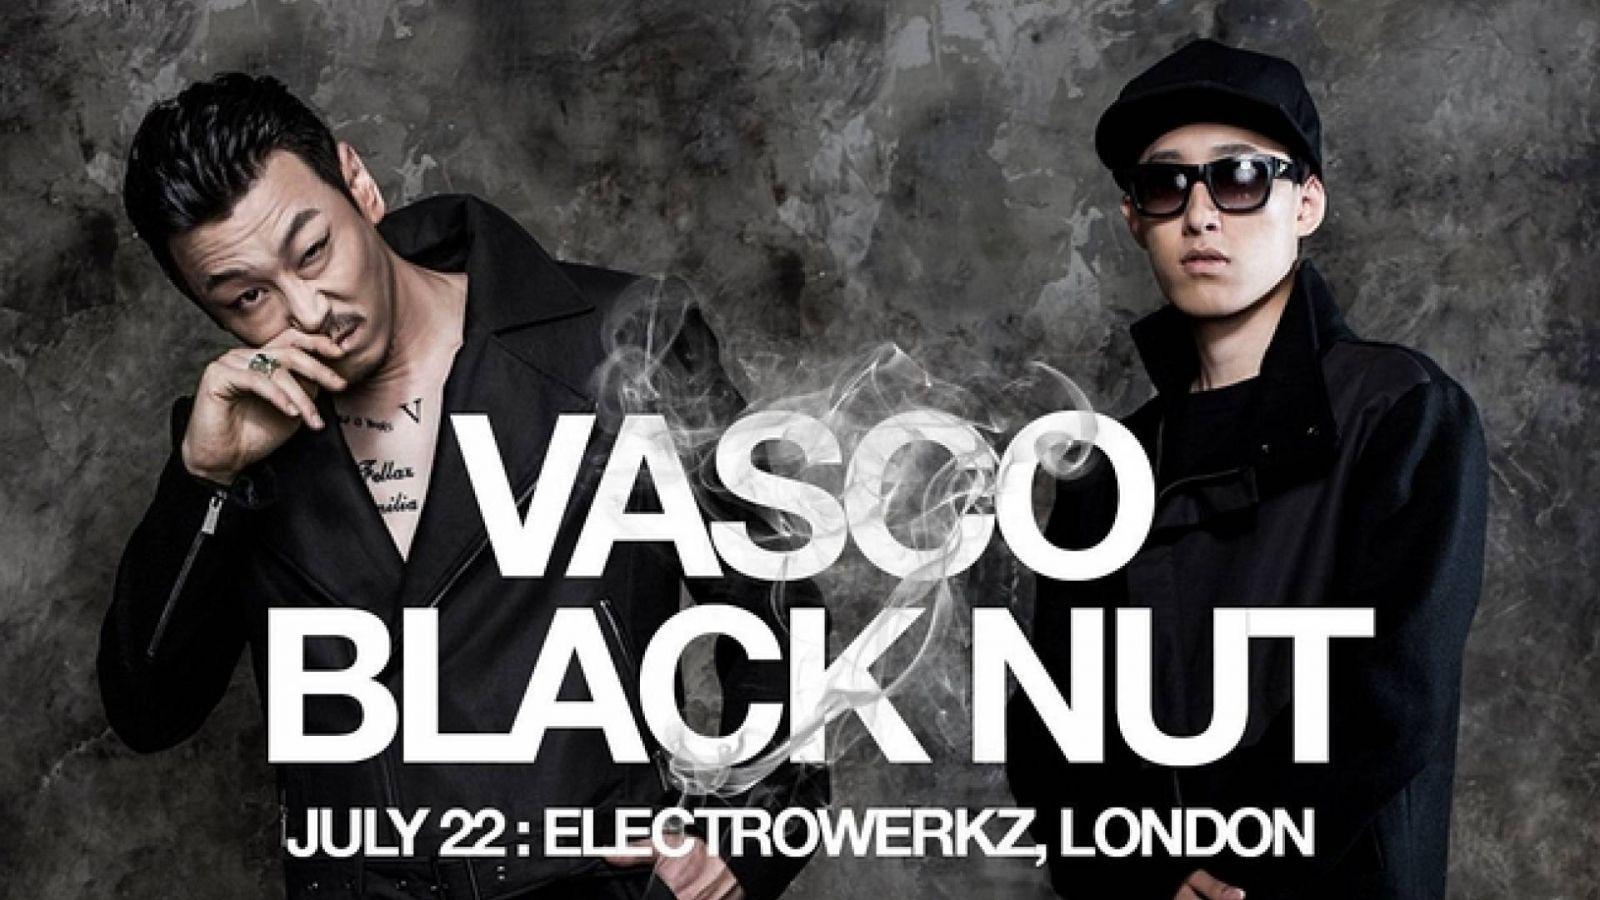 Räppärit Vasco ja Black Nut esiintyvät Lontoossa © All Rights Reserved.